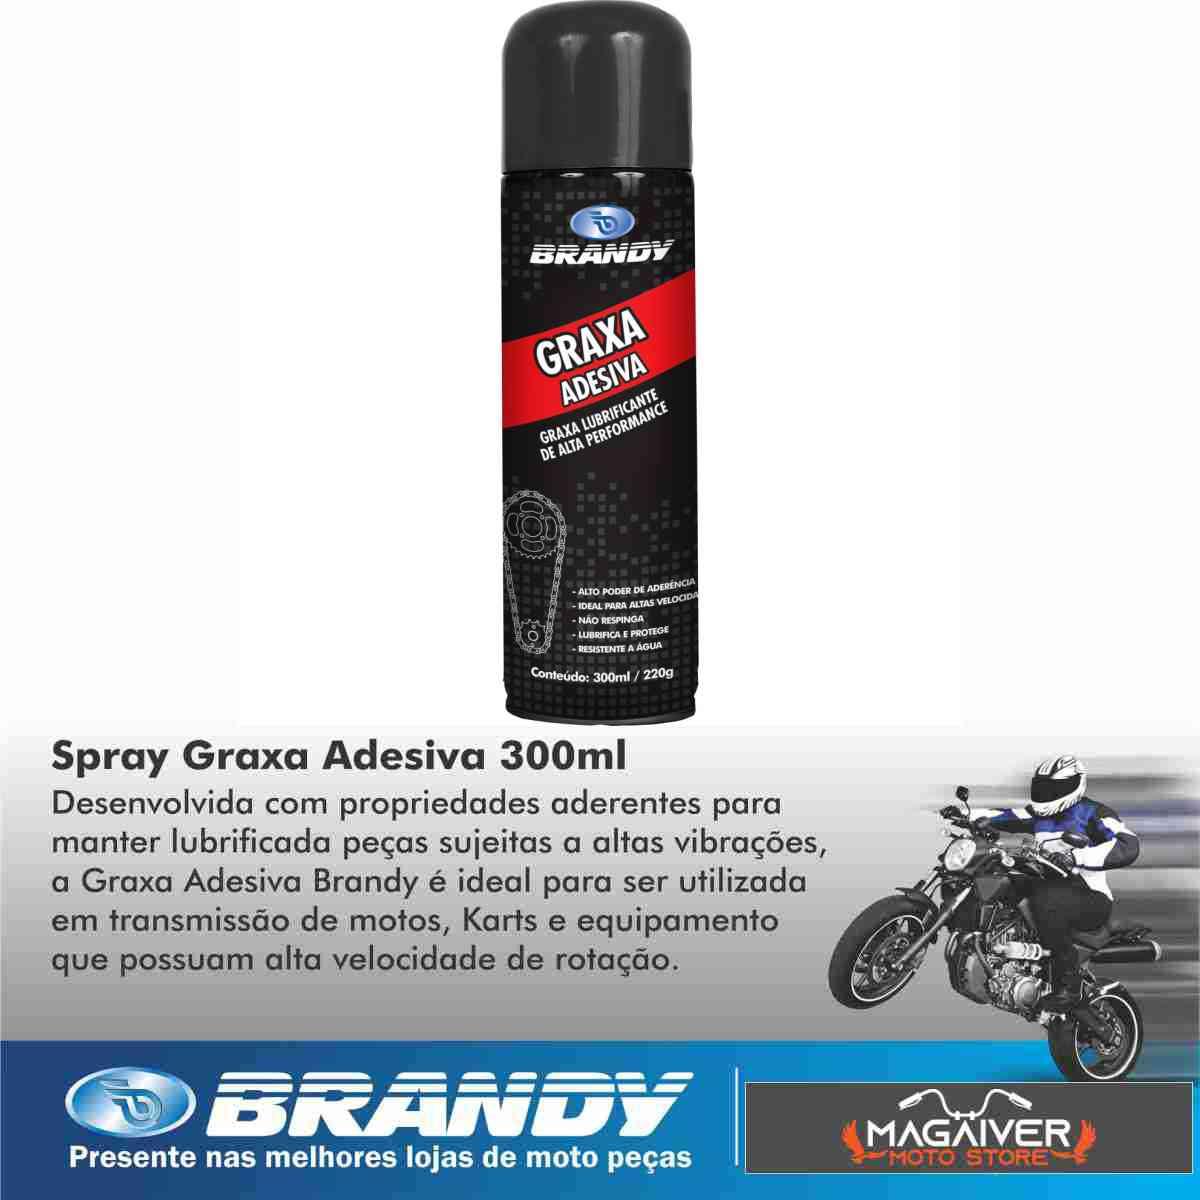 KIT 1 GRAXA ADESIVA MOTO SPRAY BRANDY ALTA PERFORMANCE + 1 LUBRIFICANTE DESENGRIPANTE BY-40 300ML